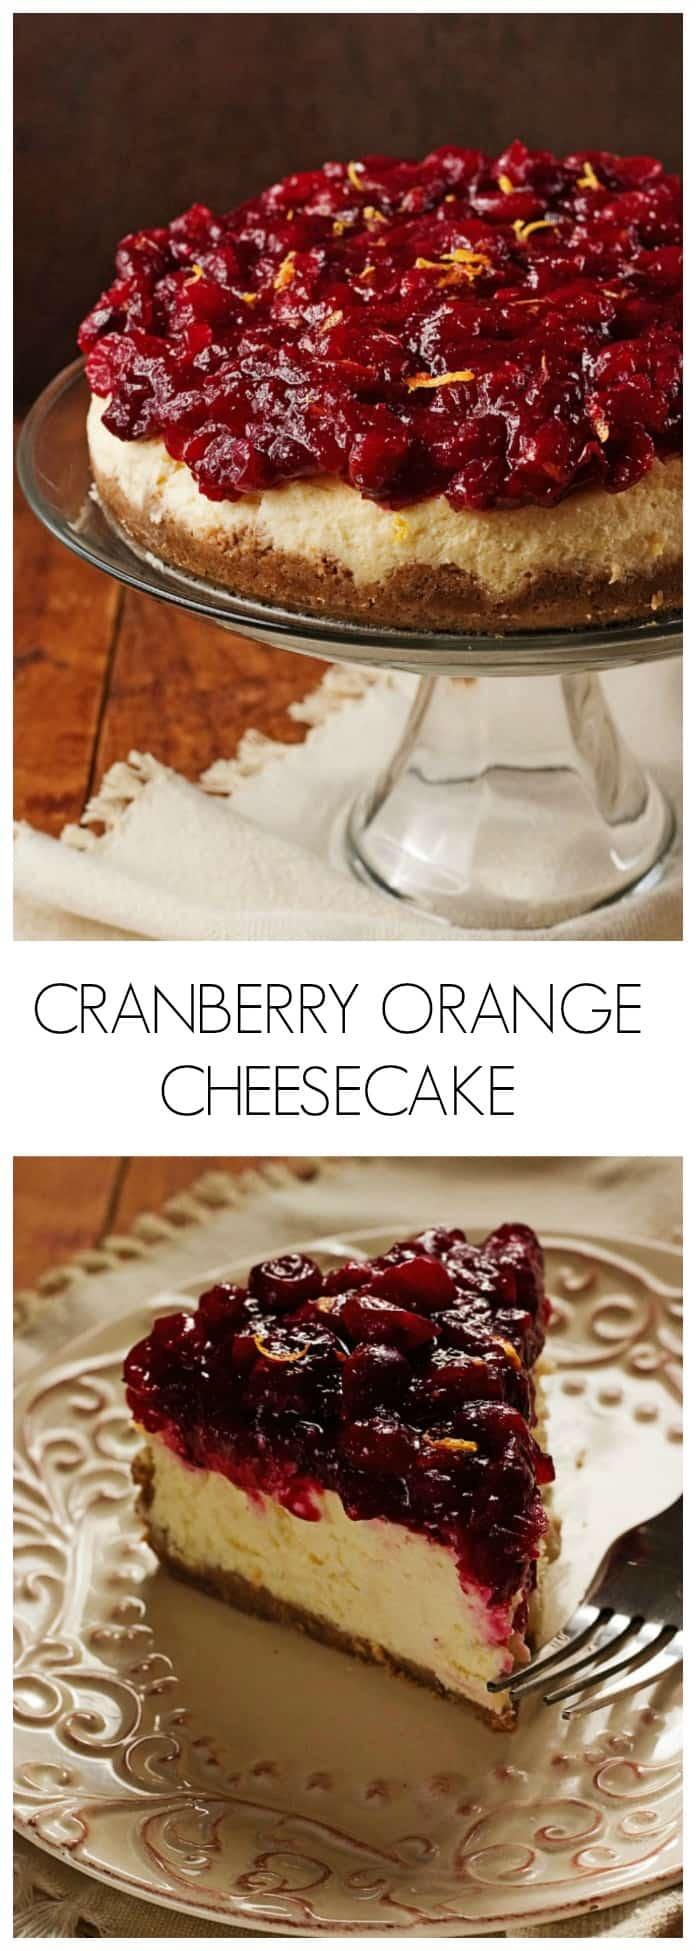 Sweet and Creamy Cranberry Orange Cheesecake Cranberry Orange Cheesecake